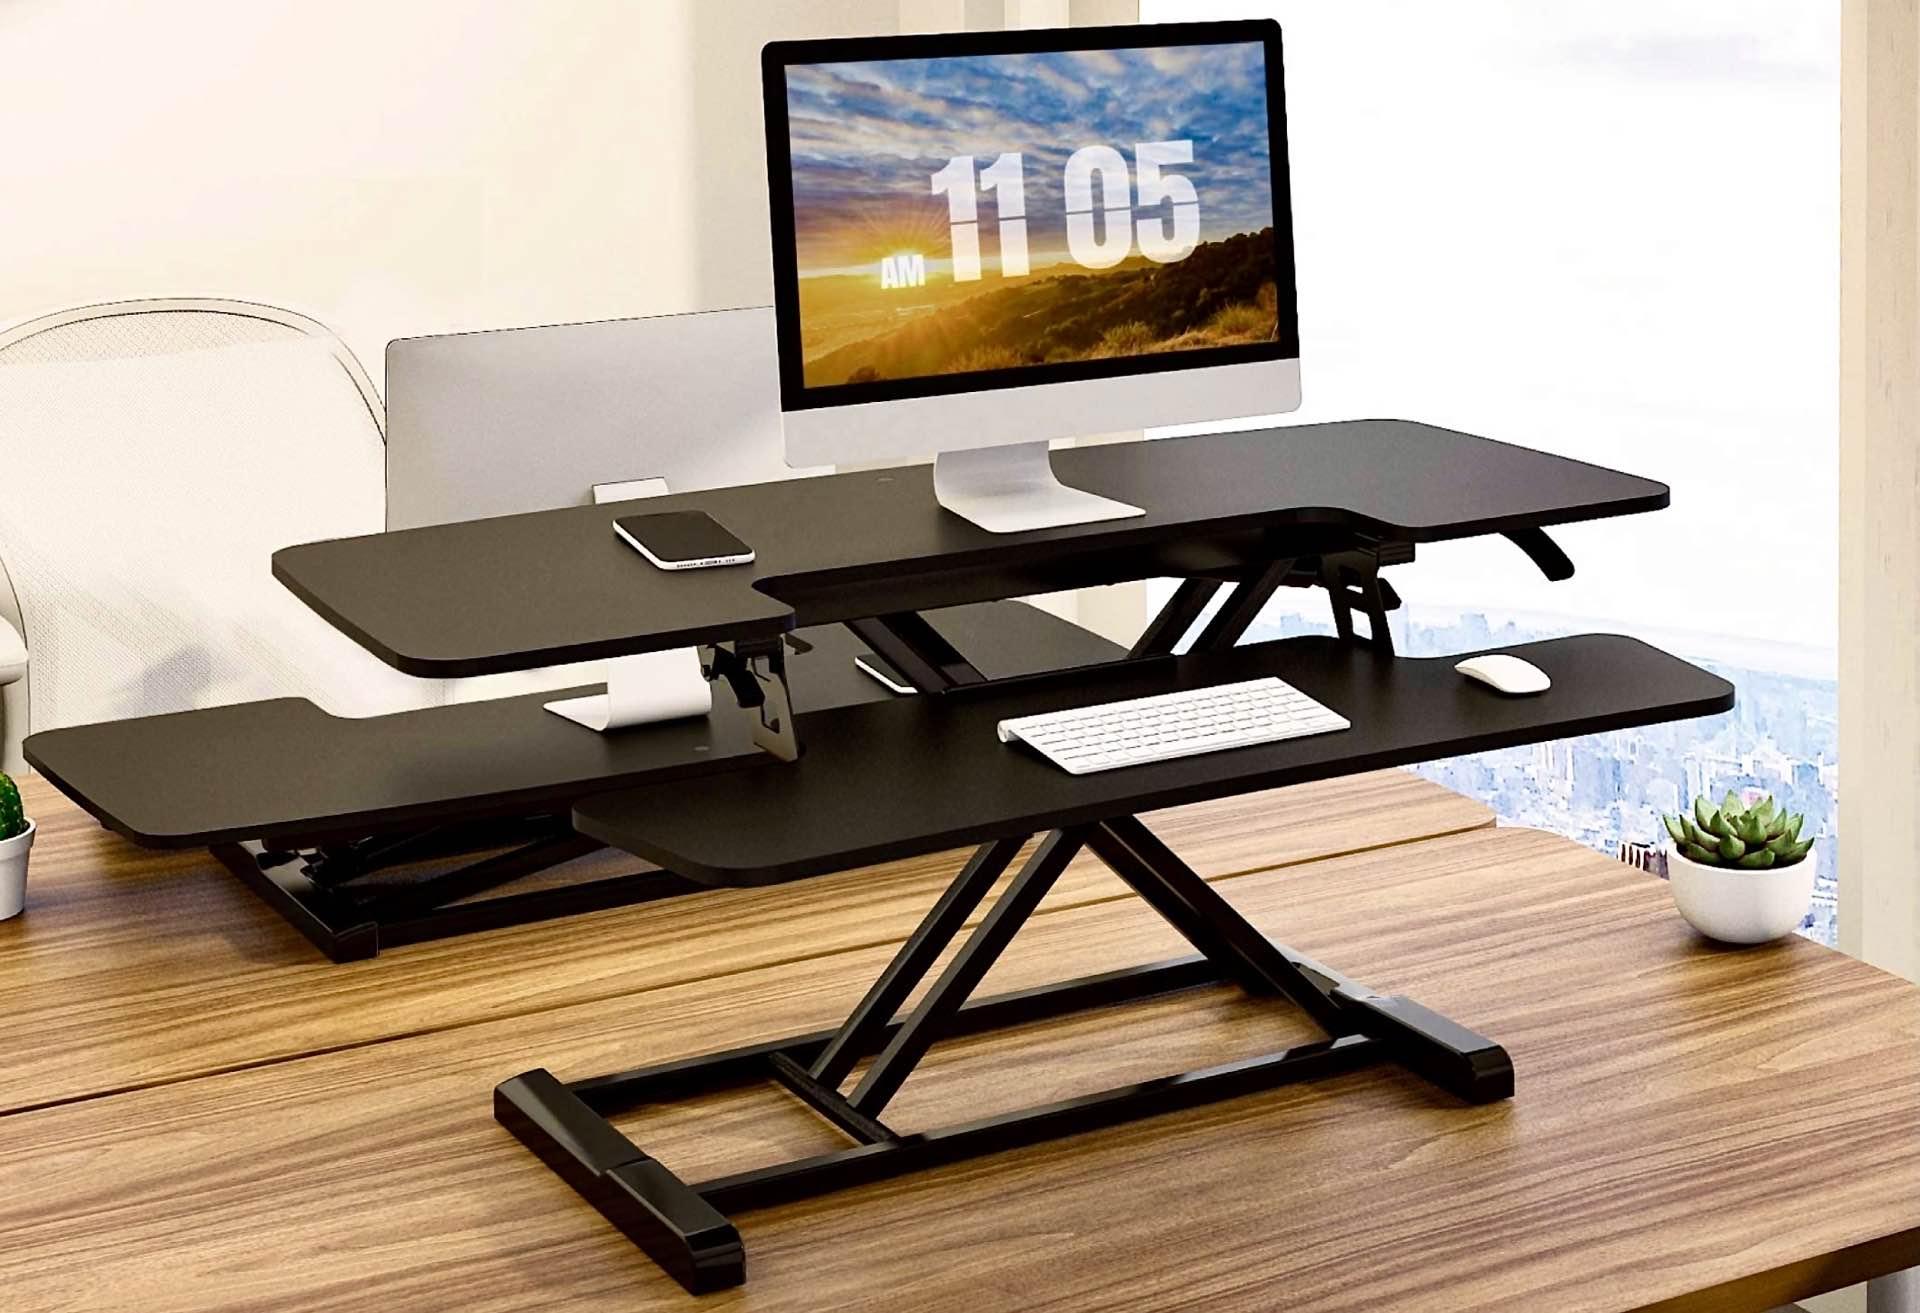 flexispot-height-adjustable-standing-desk-converter